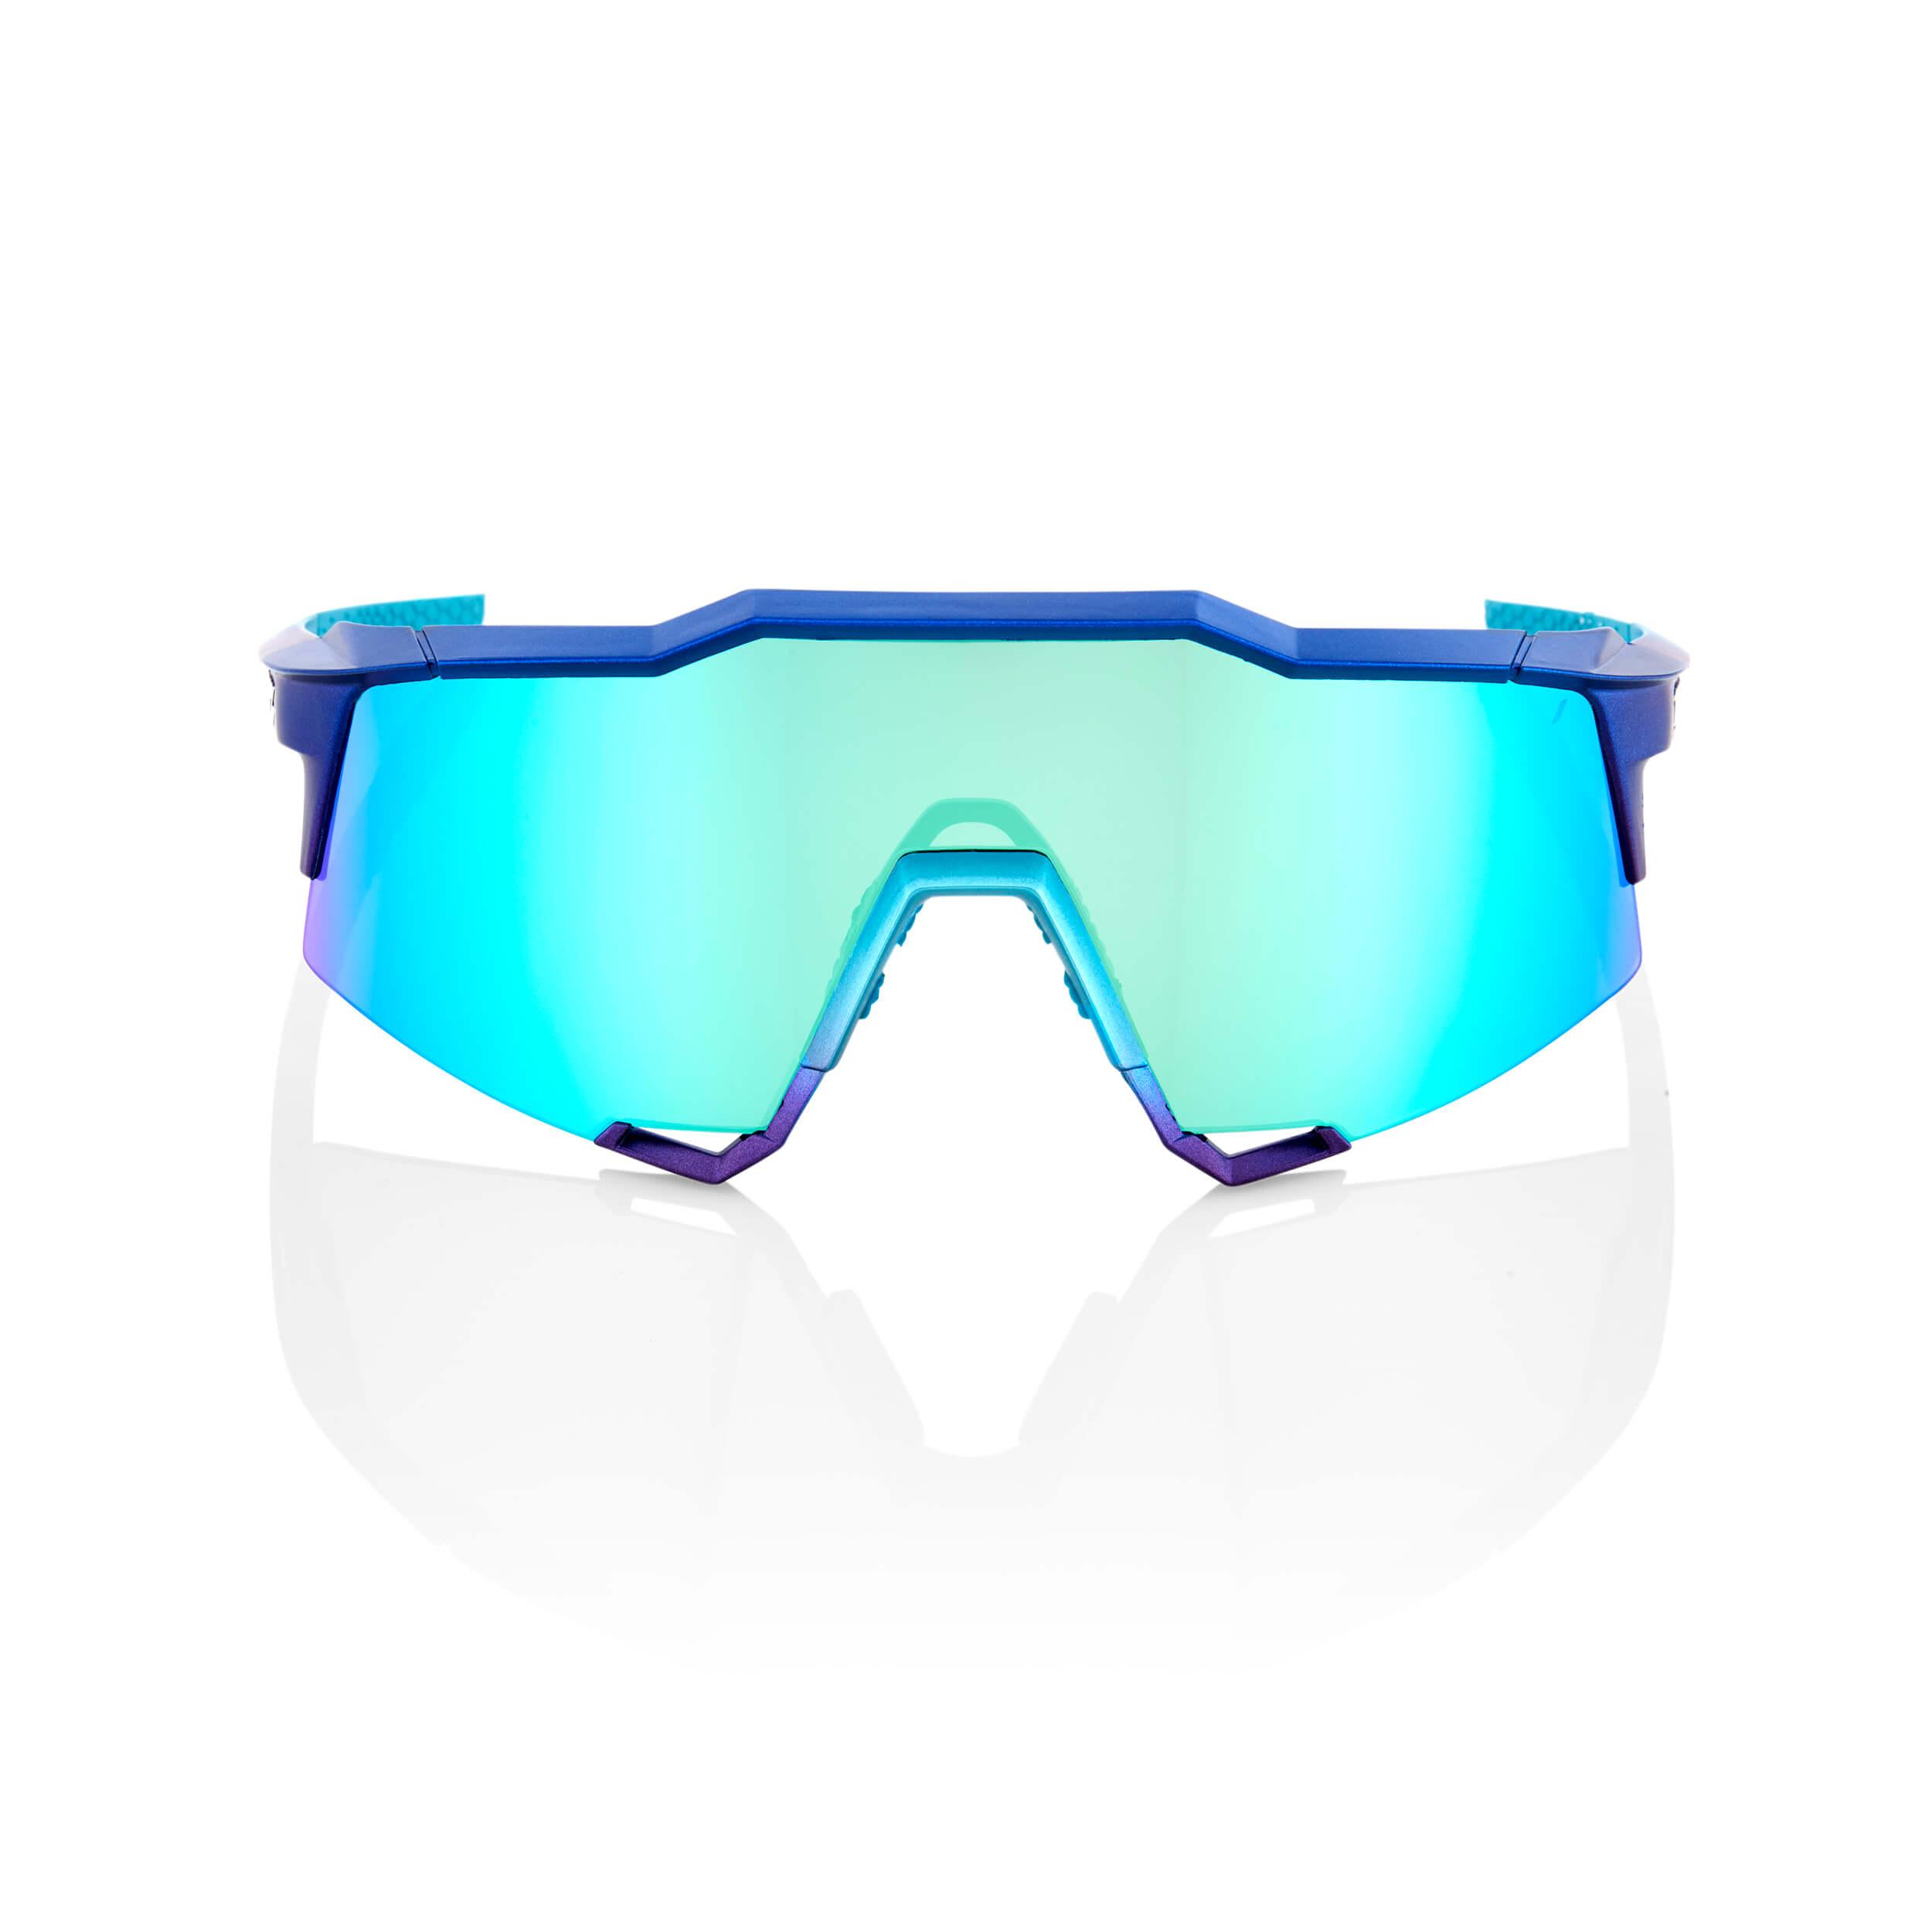 SPEEDCRAFT – Matte Metallic Into the Fade – Blue Topaz Multilayer Mirror Lens